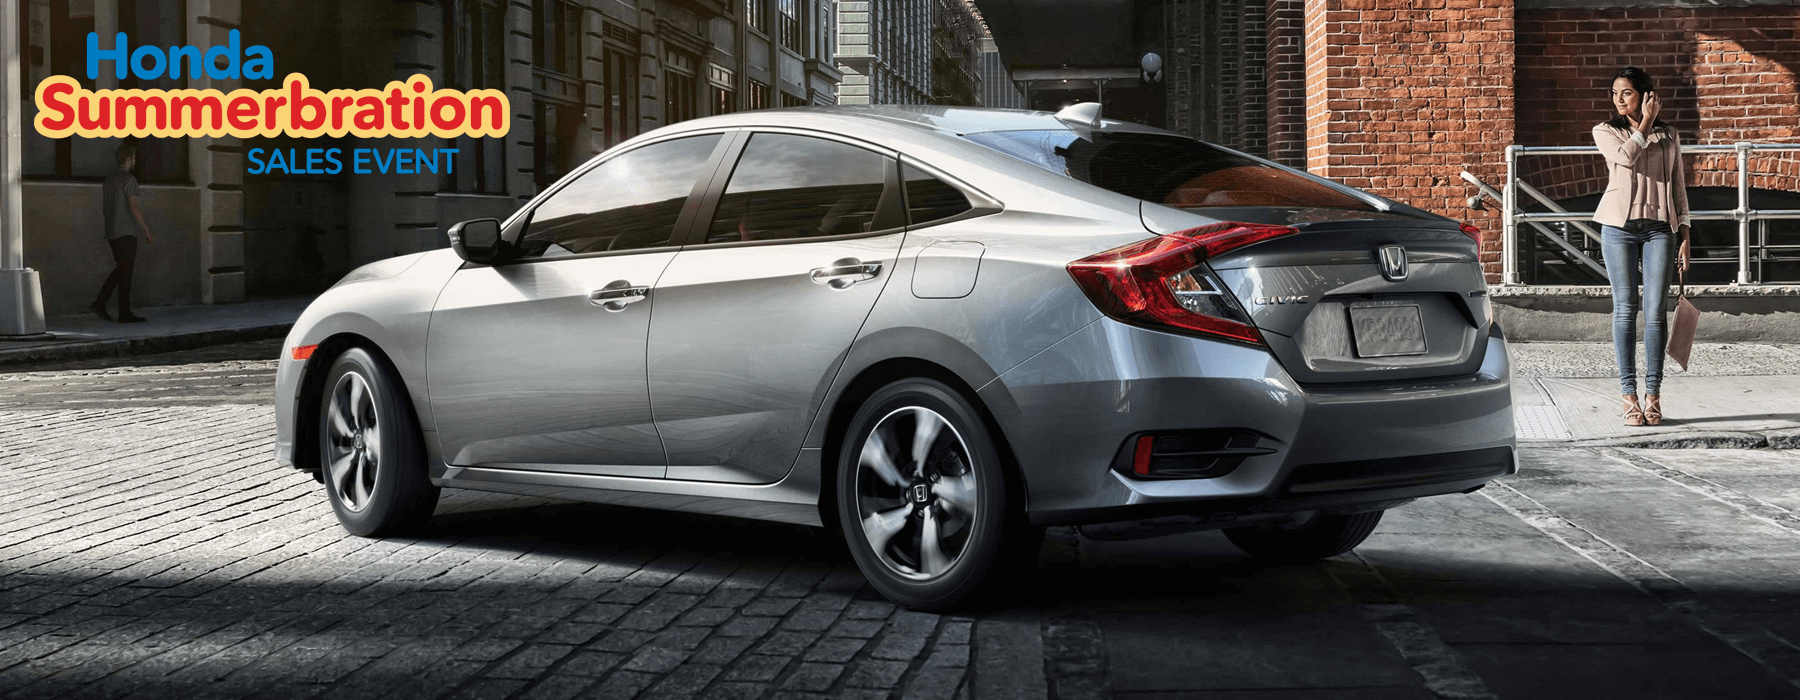 Honda Summerbration Sale 2017 Civic Sedan